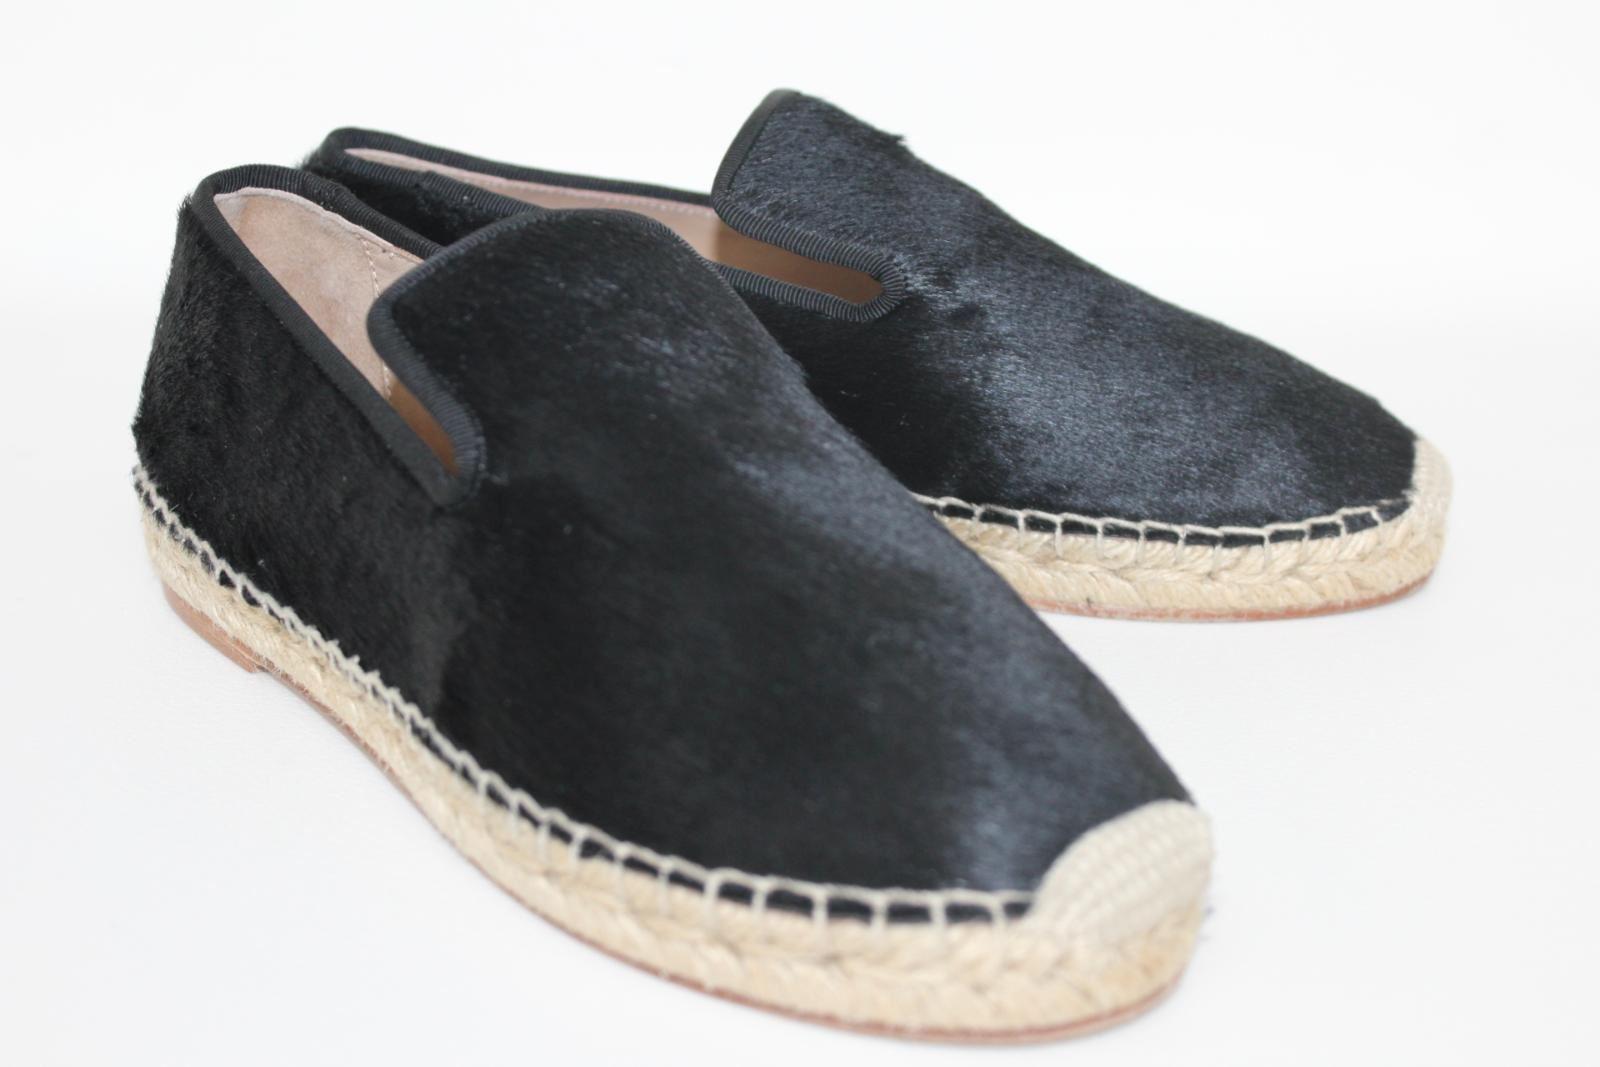 CELINE-Stacy-Black-Pony-Hair-Ladies-Flat-Espadrilles-Shoes-UK3-EU36-5-BNIB